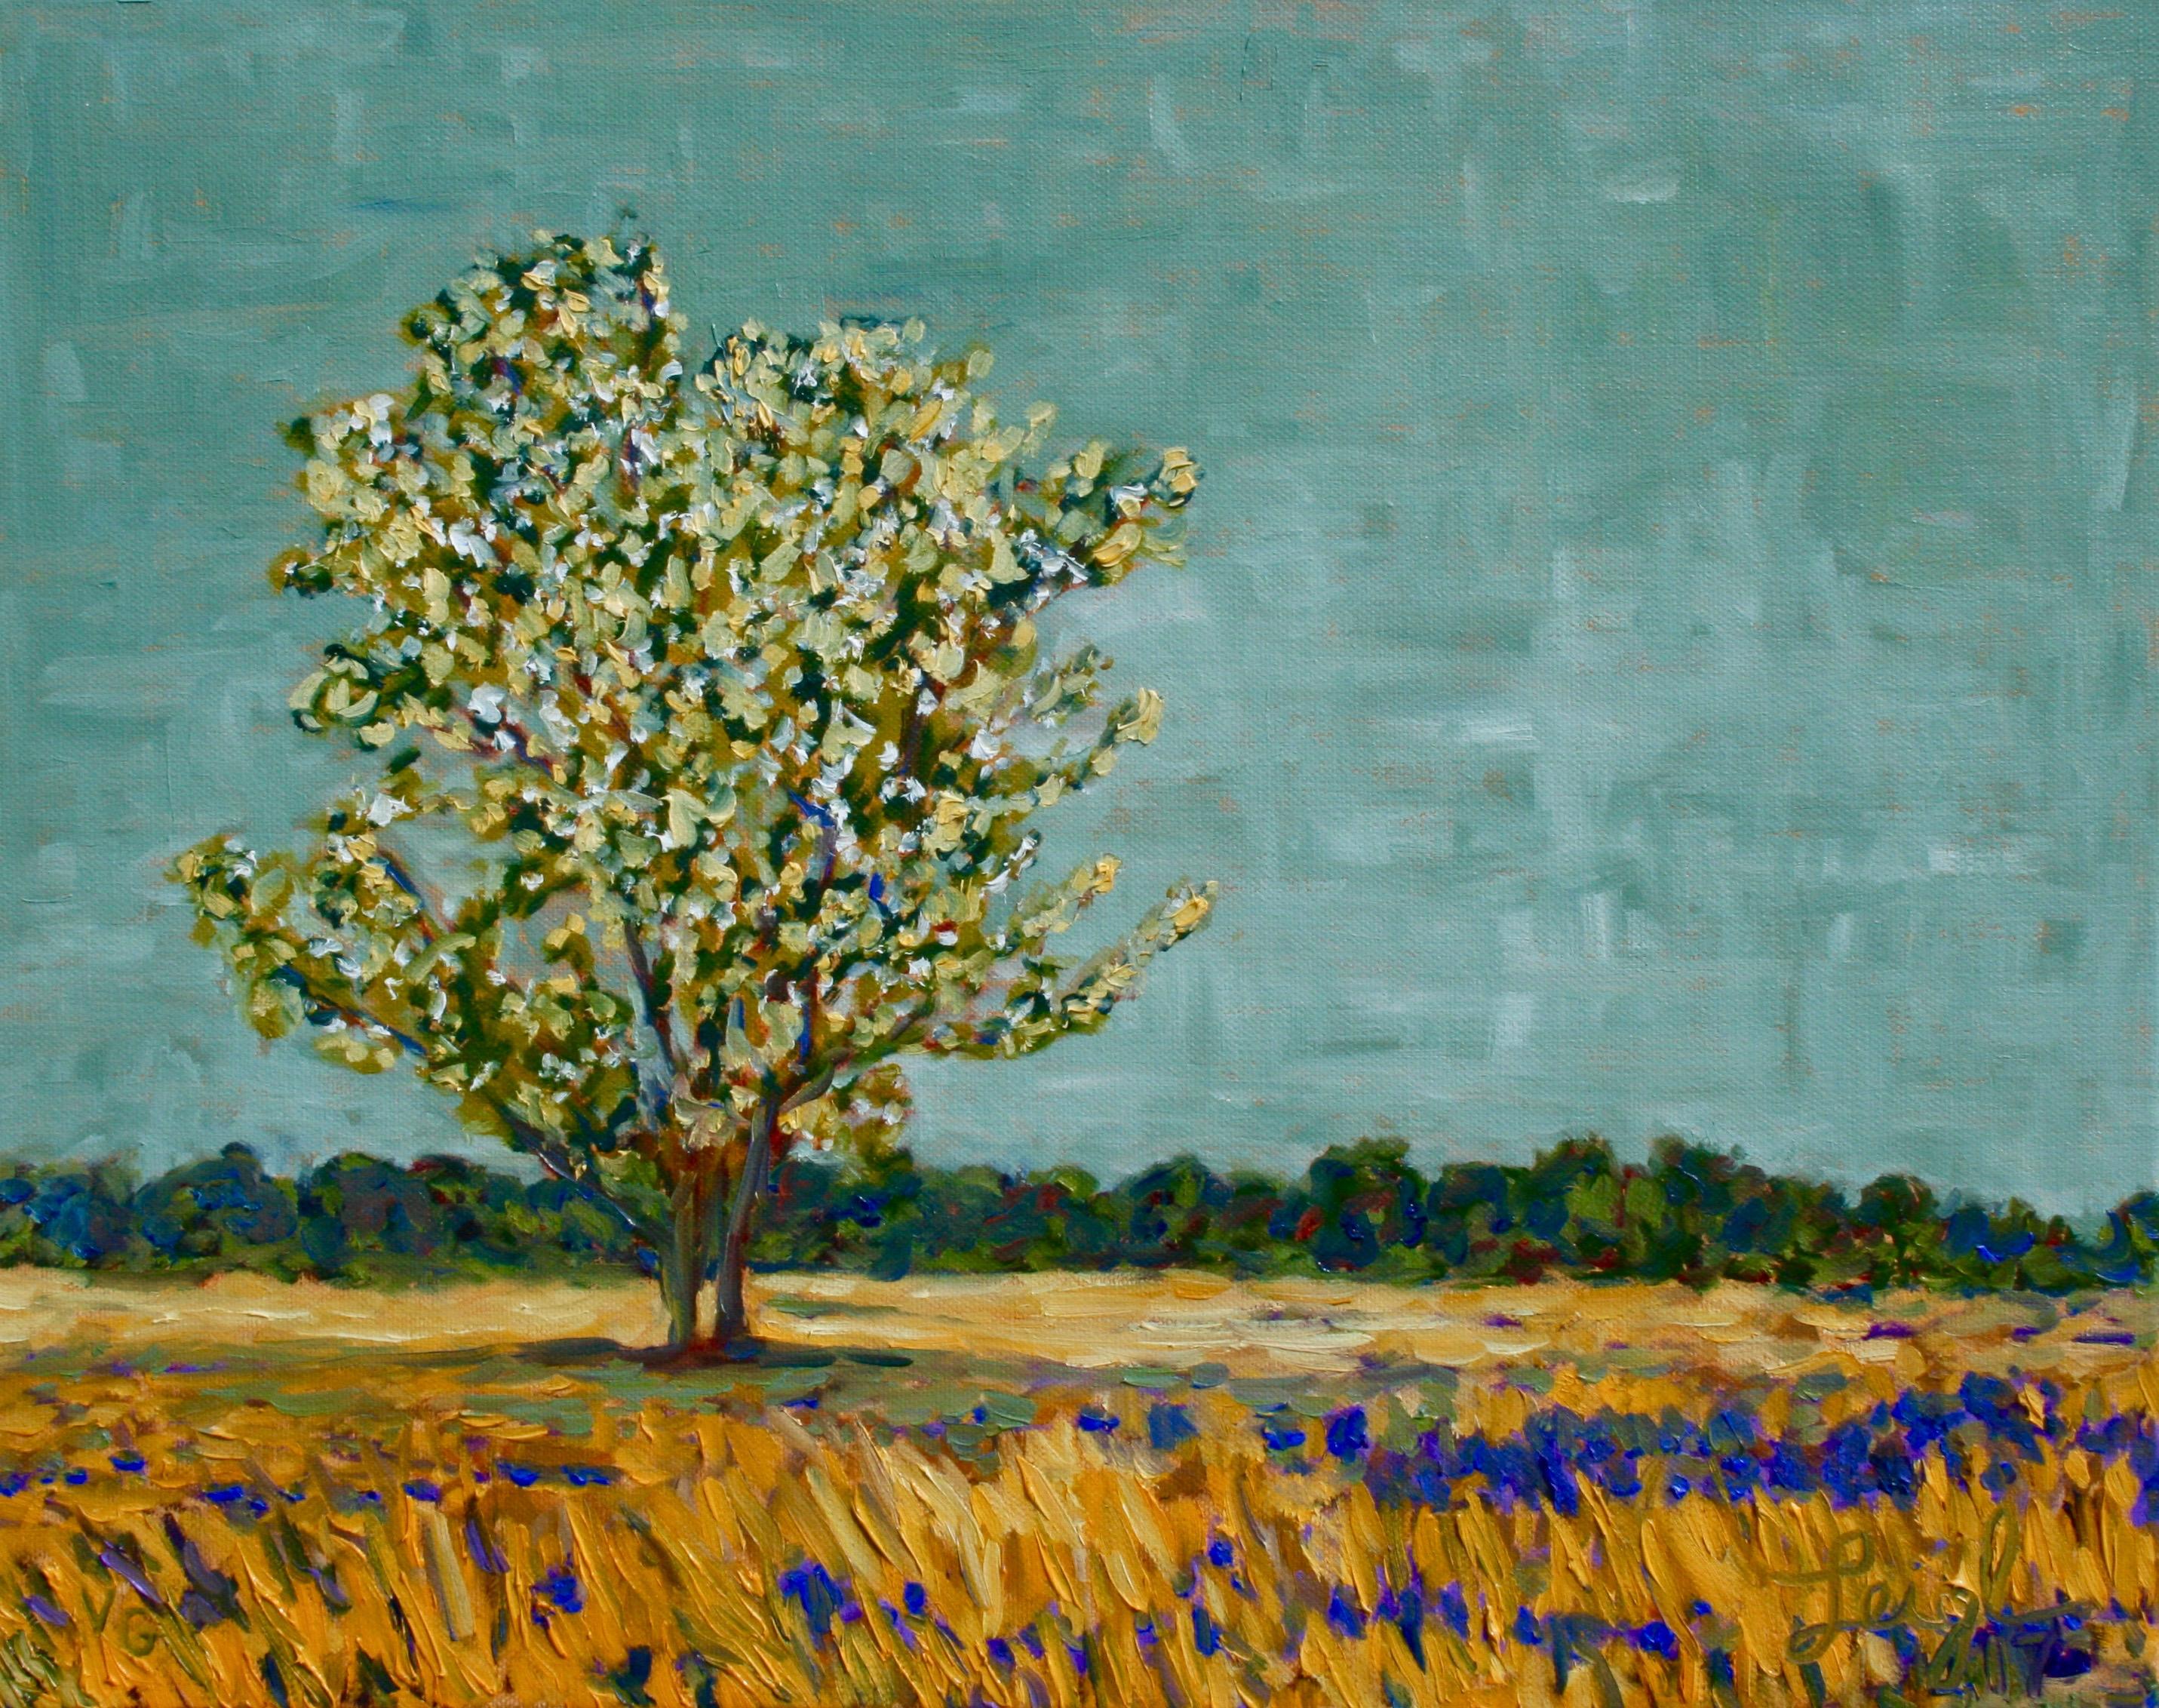 Tree on Heath #1  ~   (In the style of Van Gogh) Annette Heinmeyer, Phoenix, AZ  2017  •  20 x 16